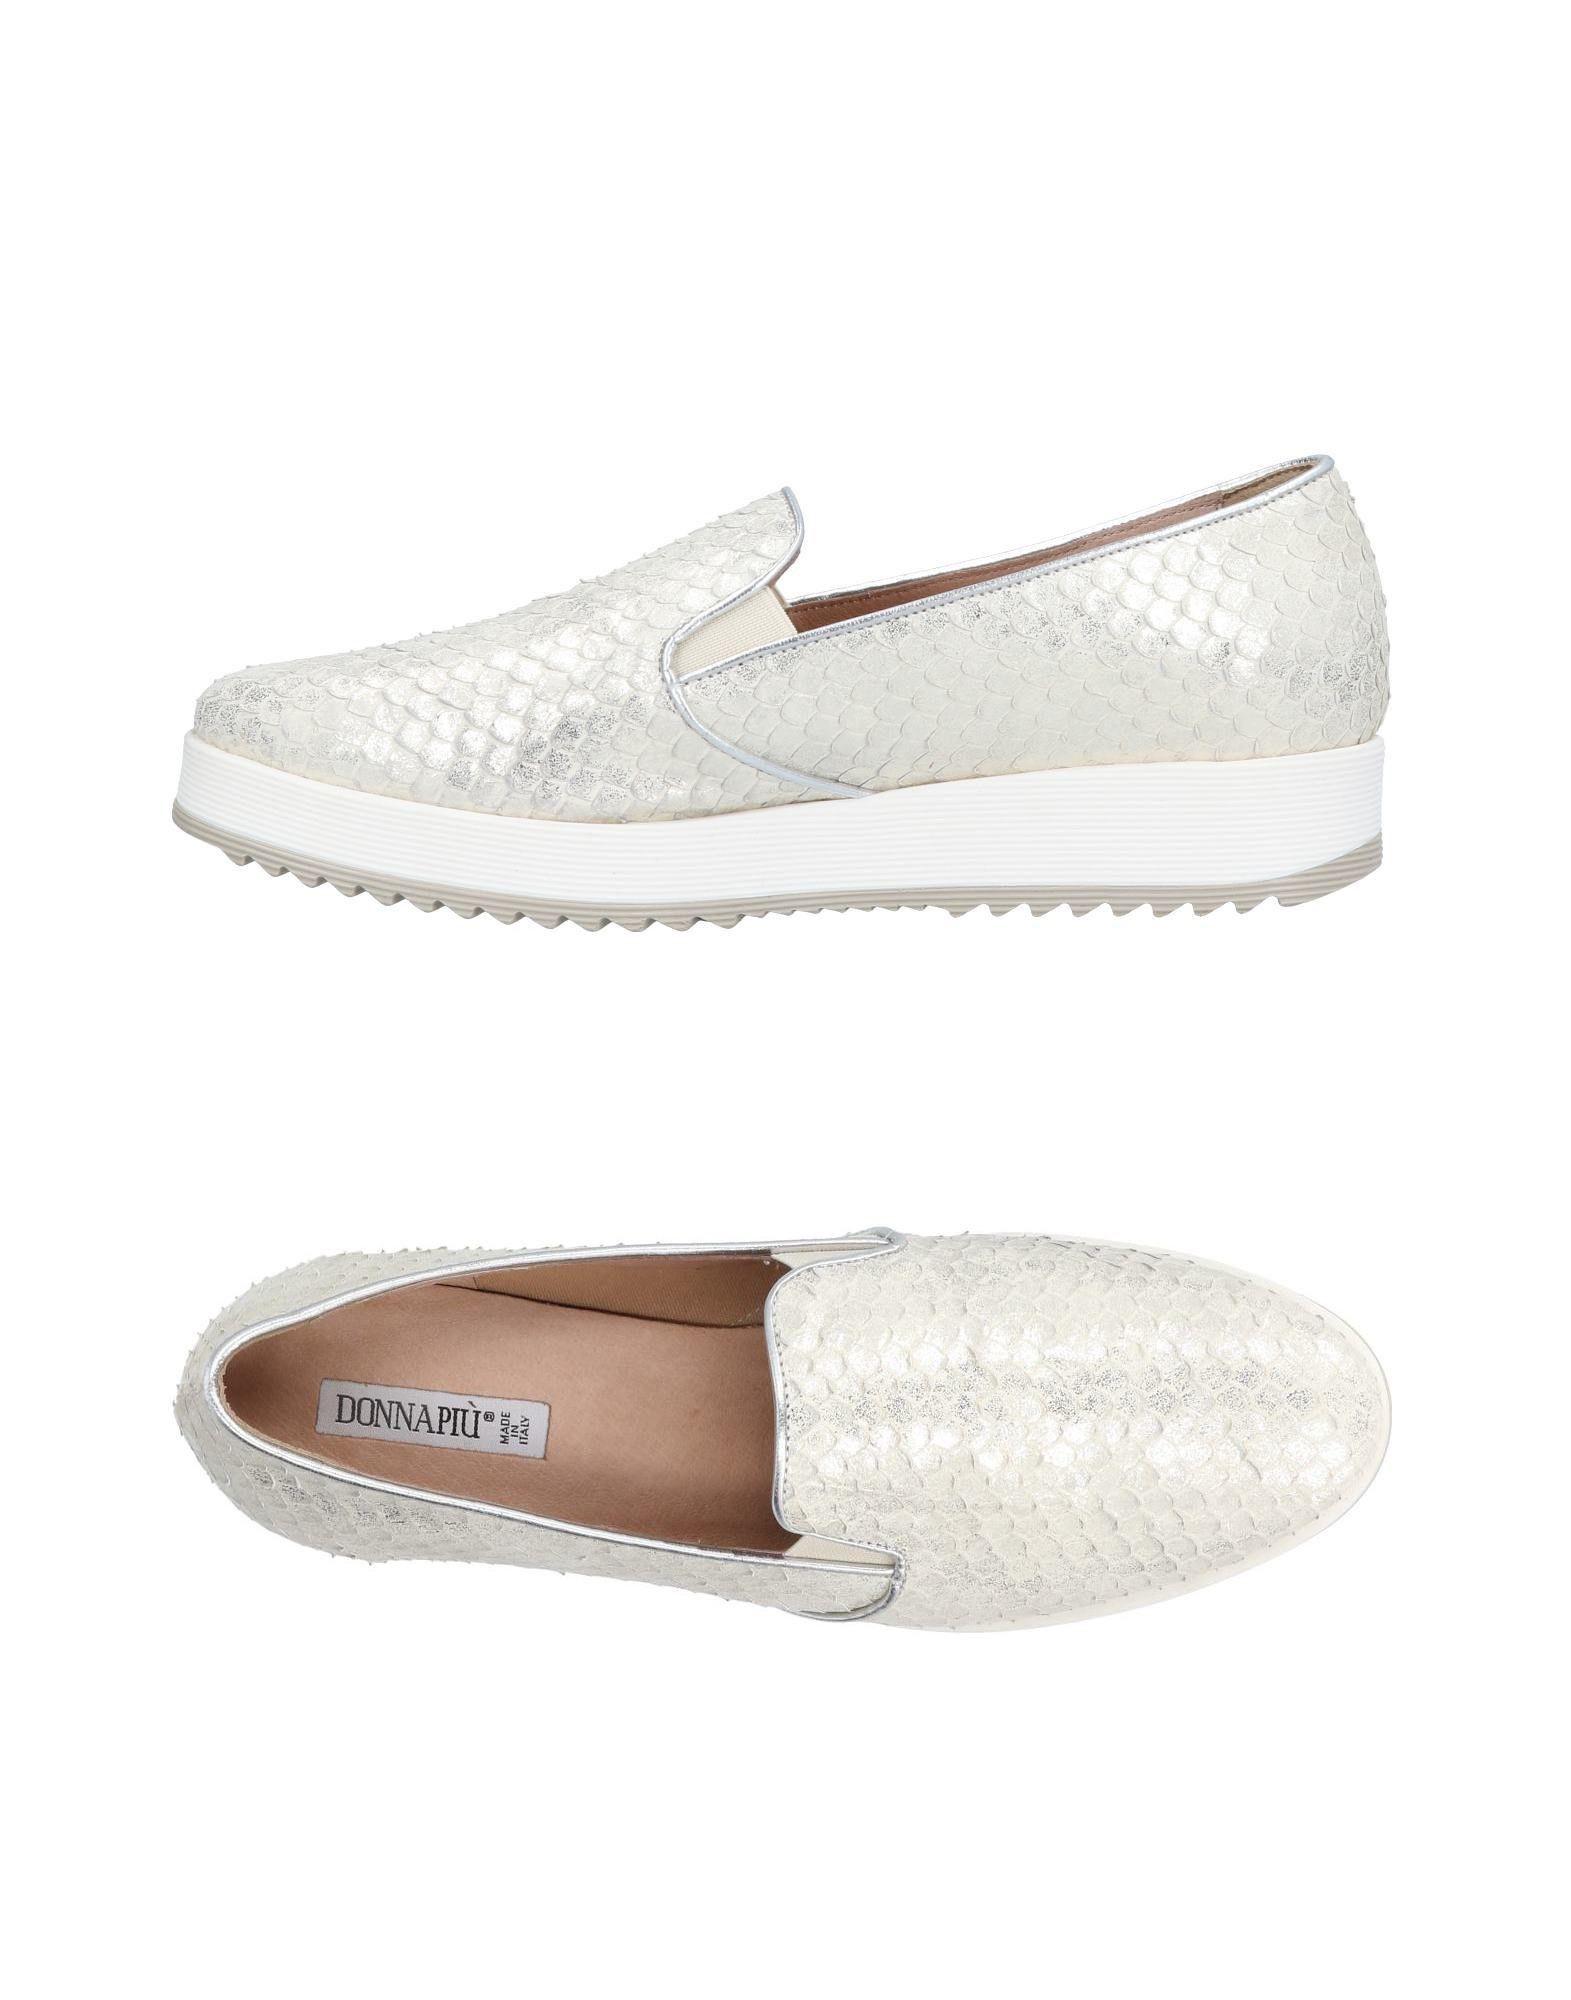 Donna Più Gute Sneakers Damen  11464800VP Gute Più Qualität beliebte Schuhe a73ce8